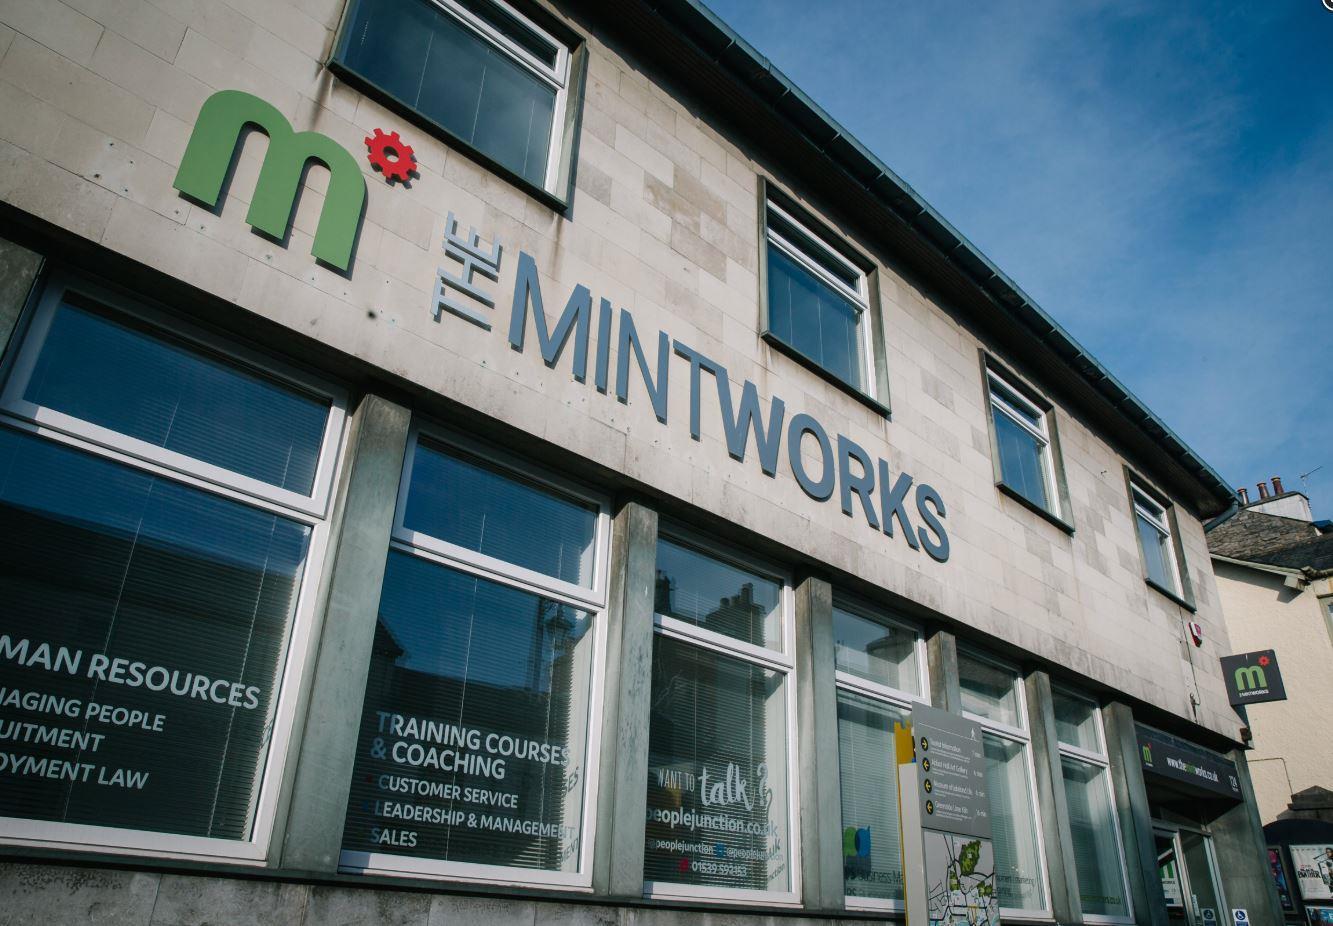 The Mint Works 124 Highgate, Kendal, North West, LA9 4HE